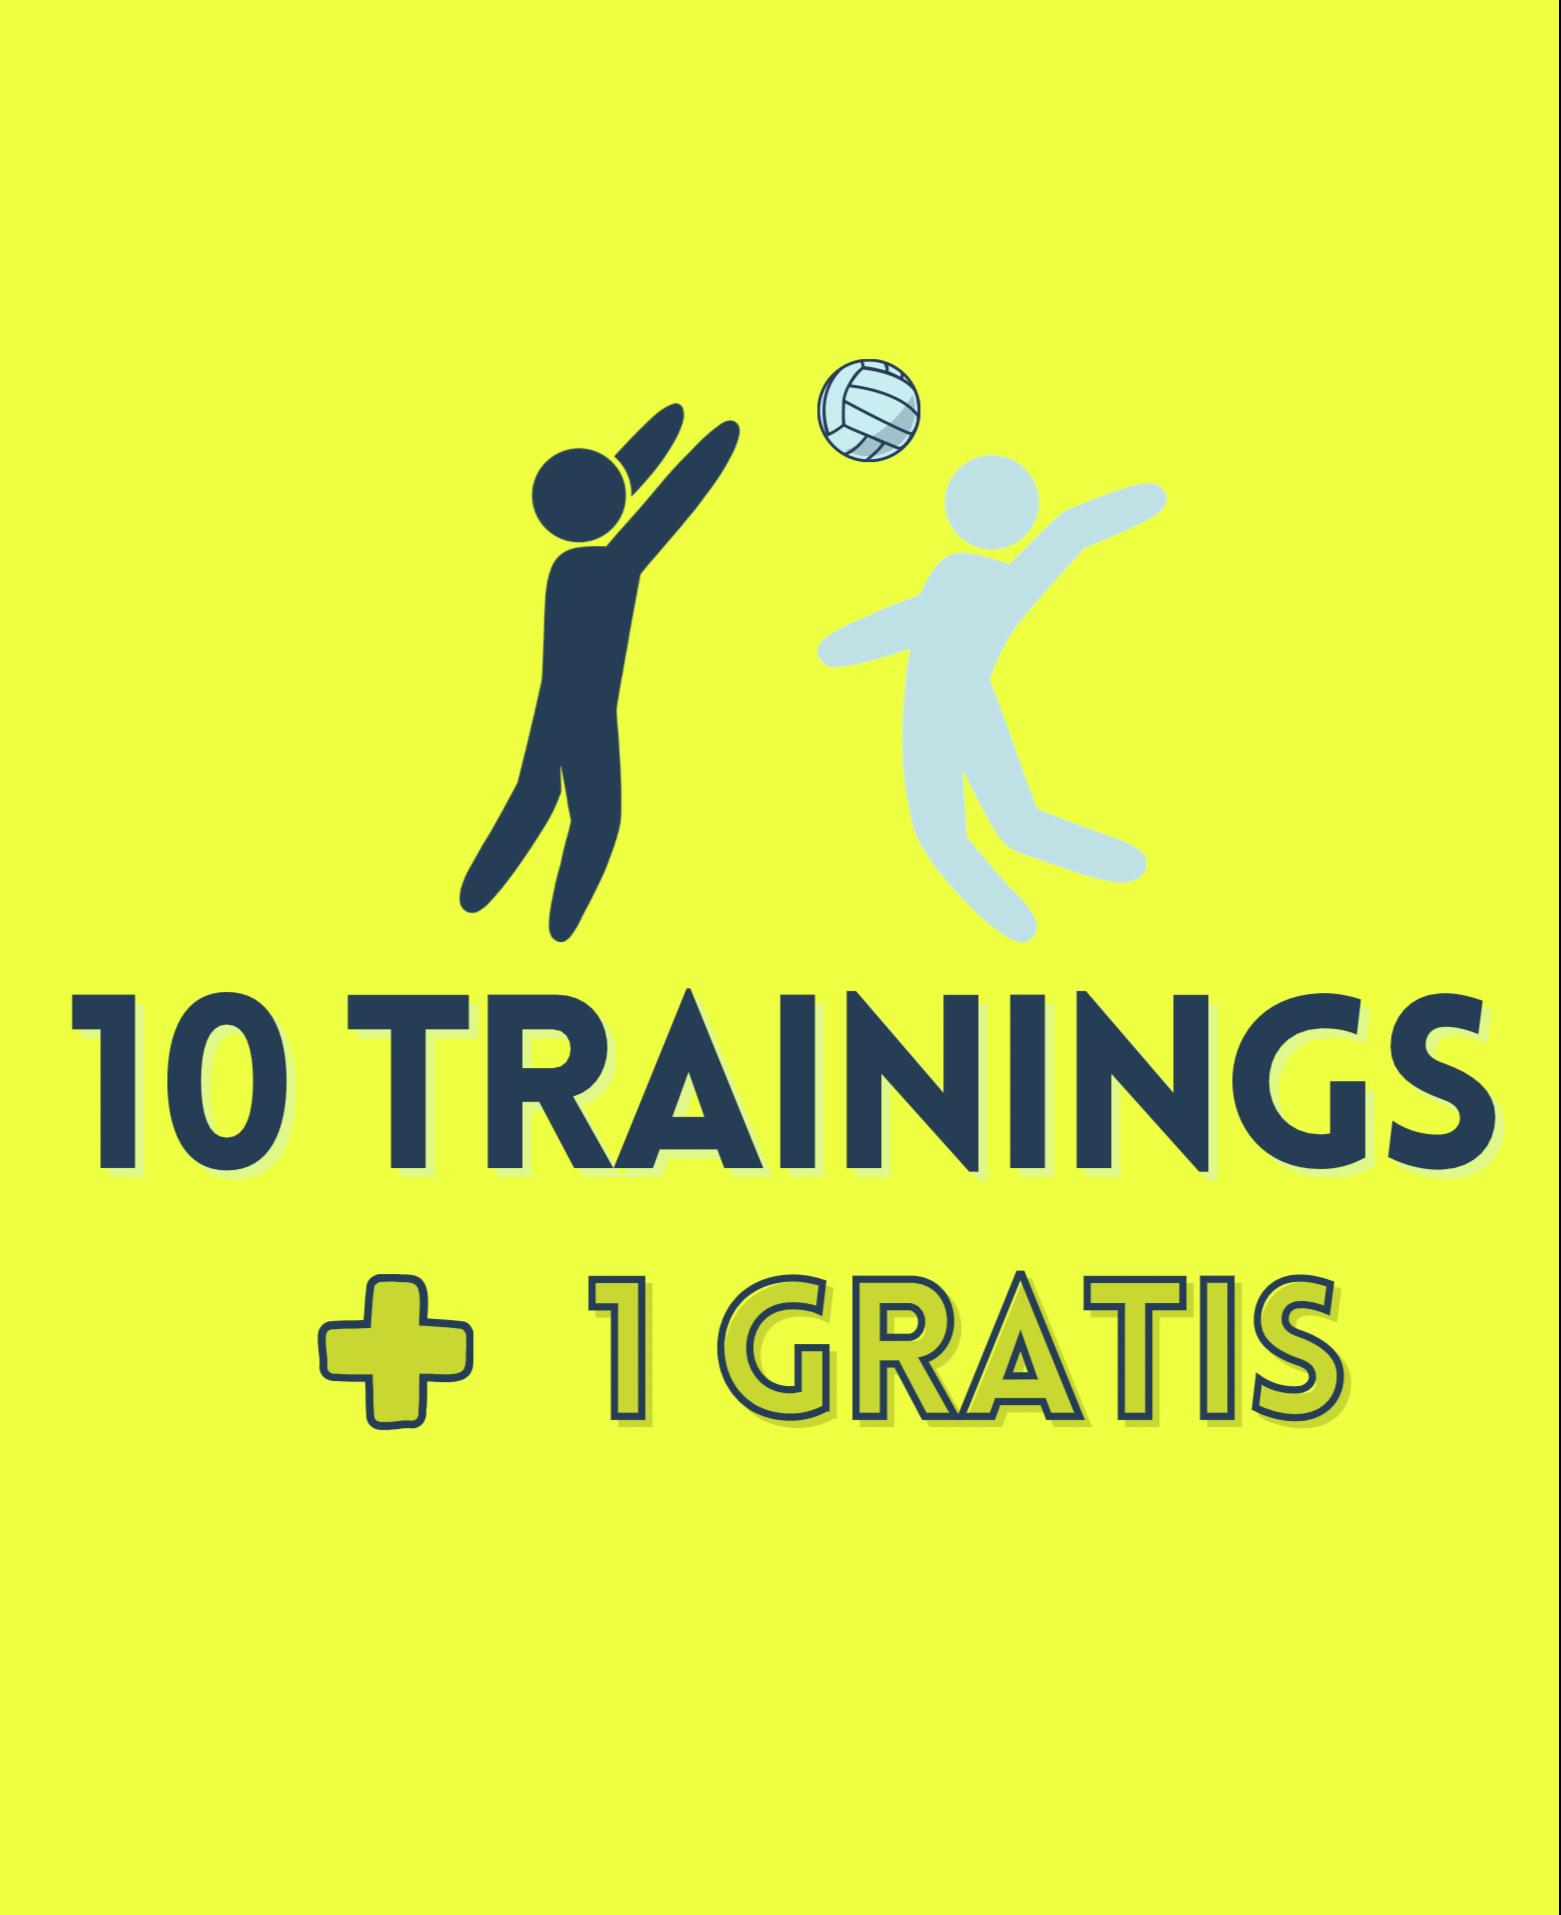 10 Trainings + 1 Gratis